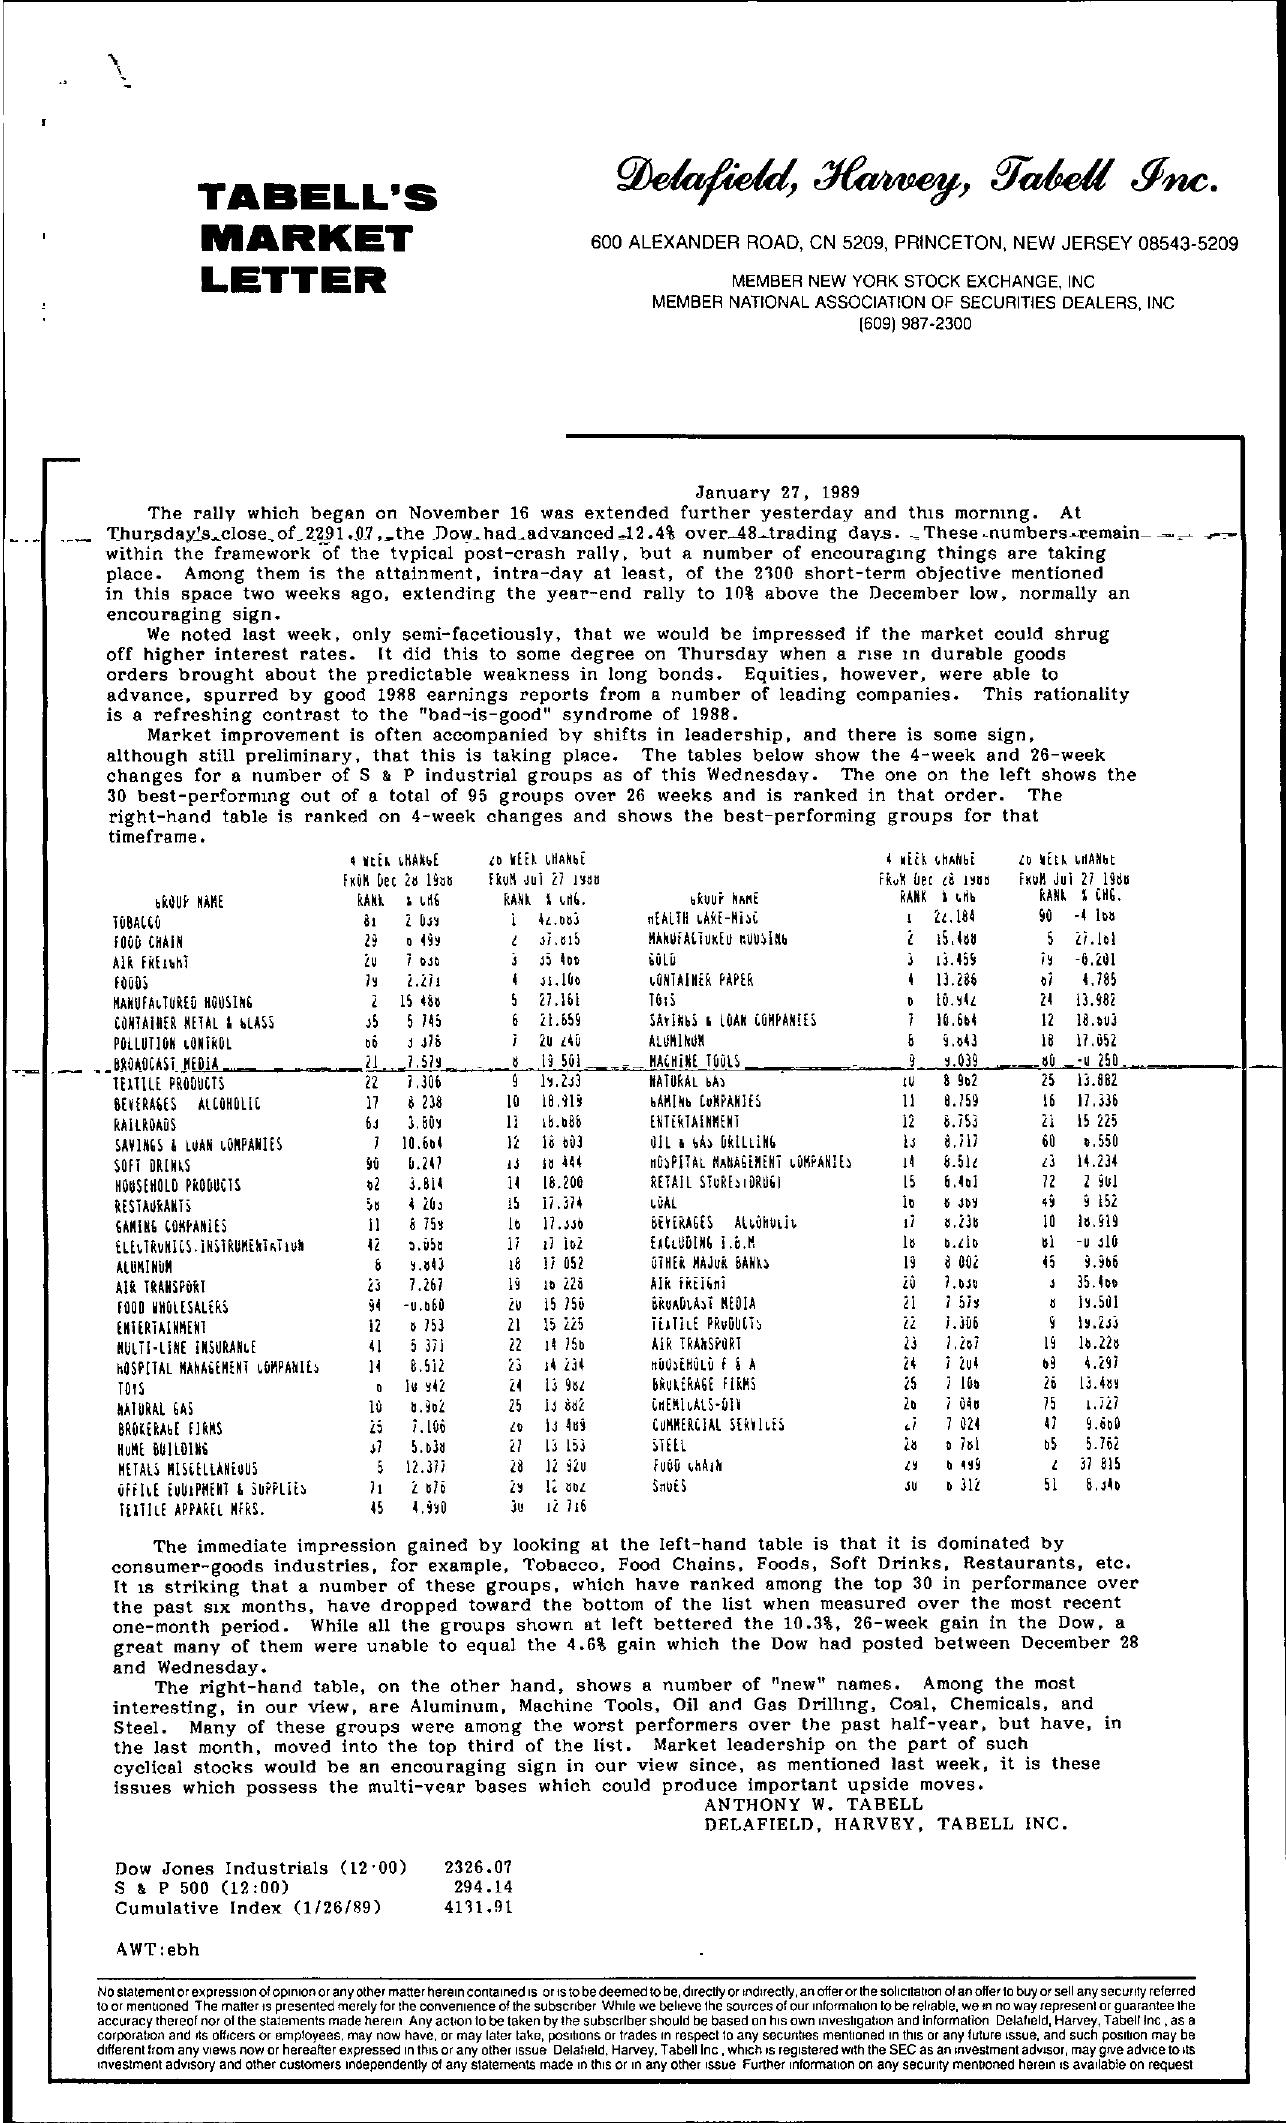 Tabell's Market Letter - January 27, 1989